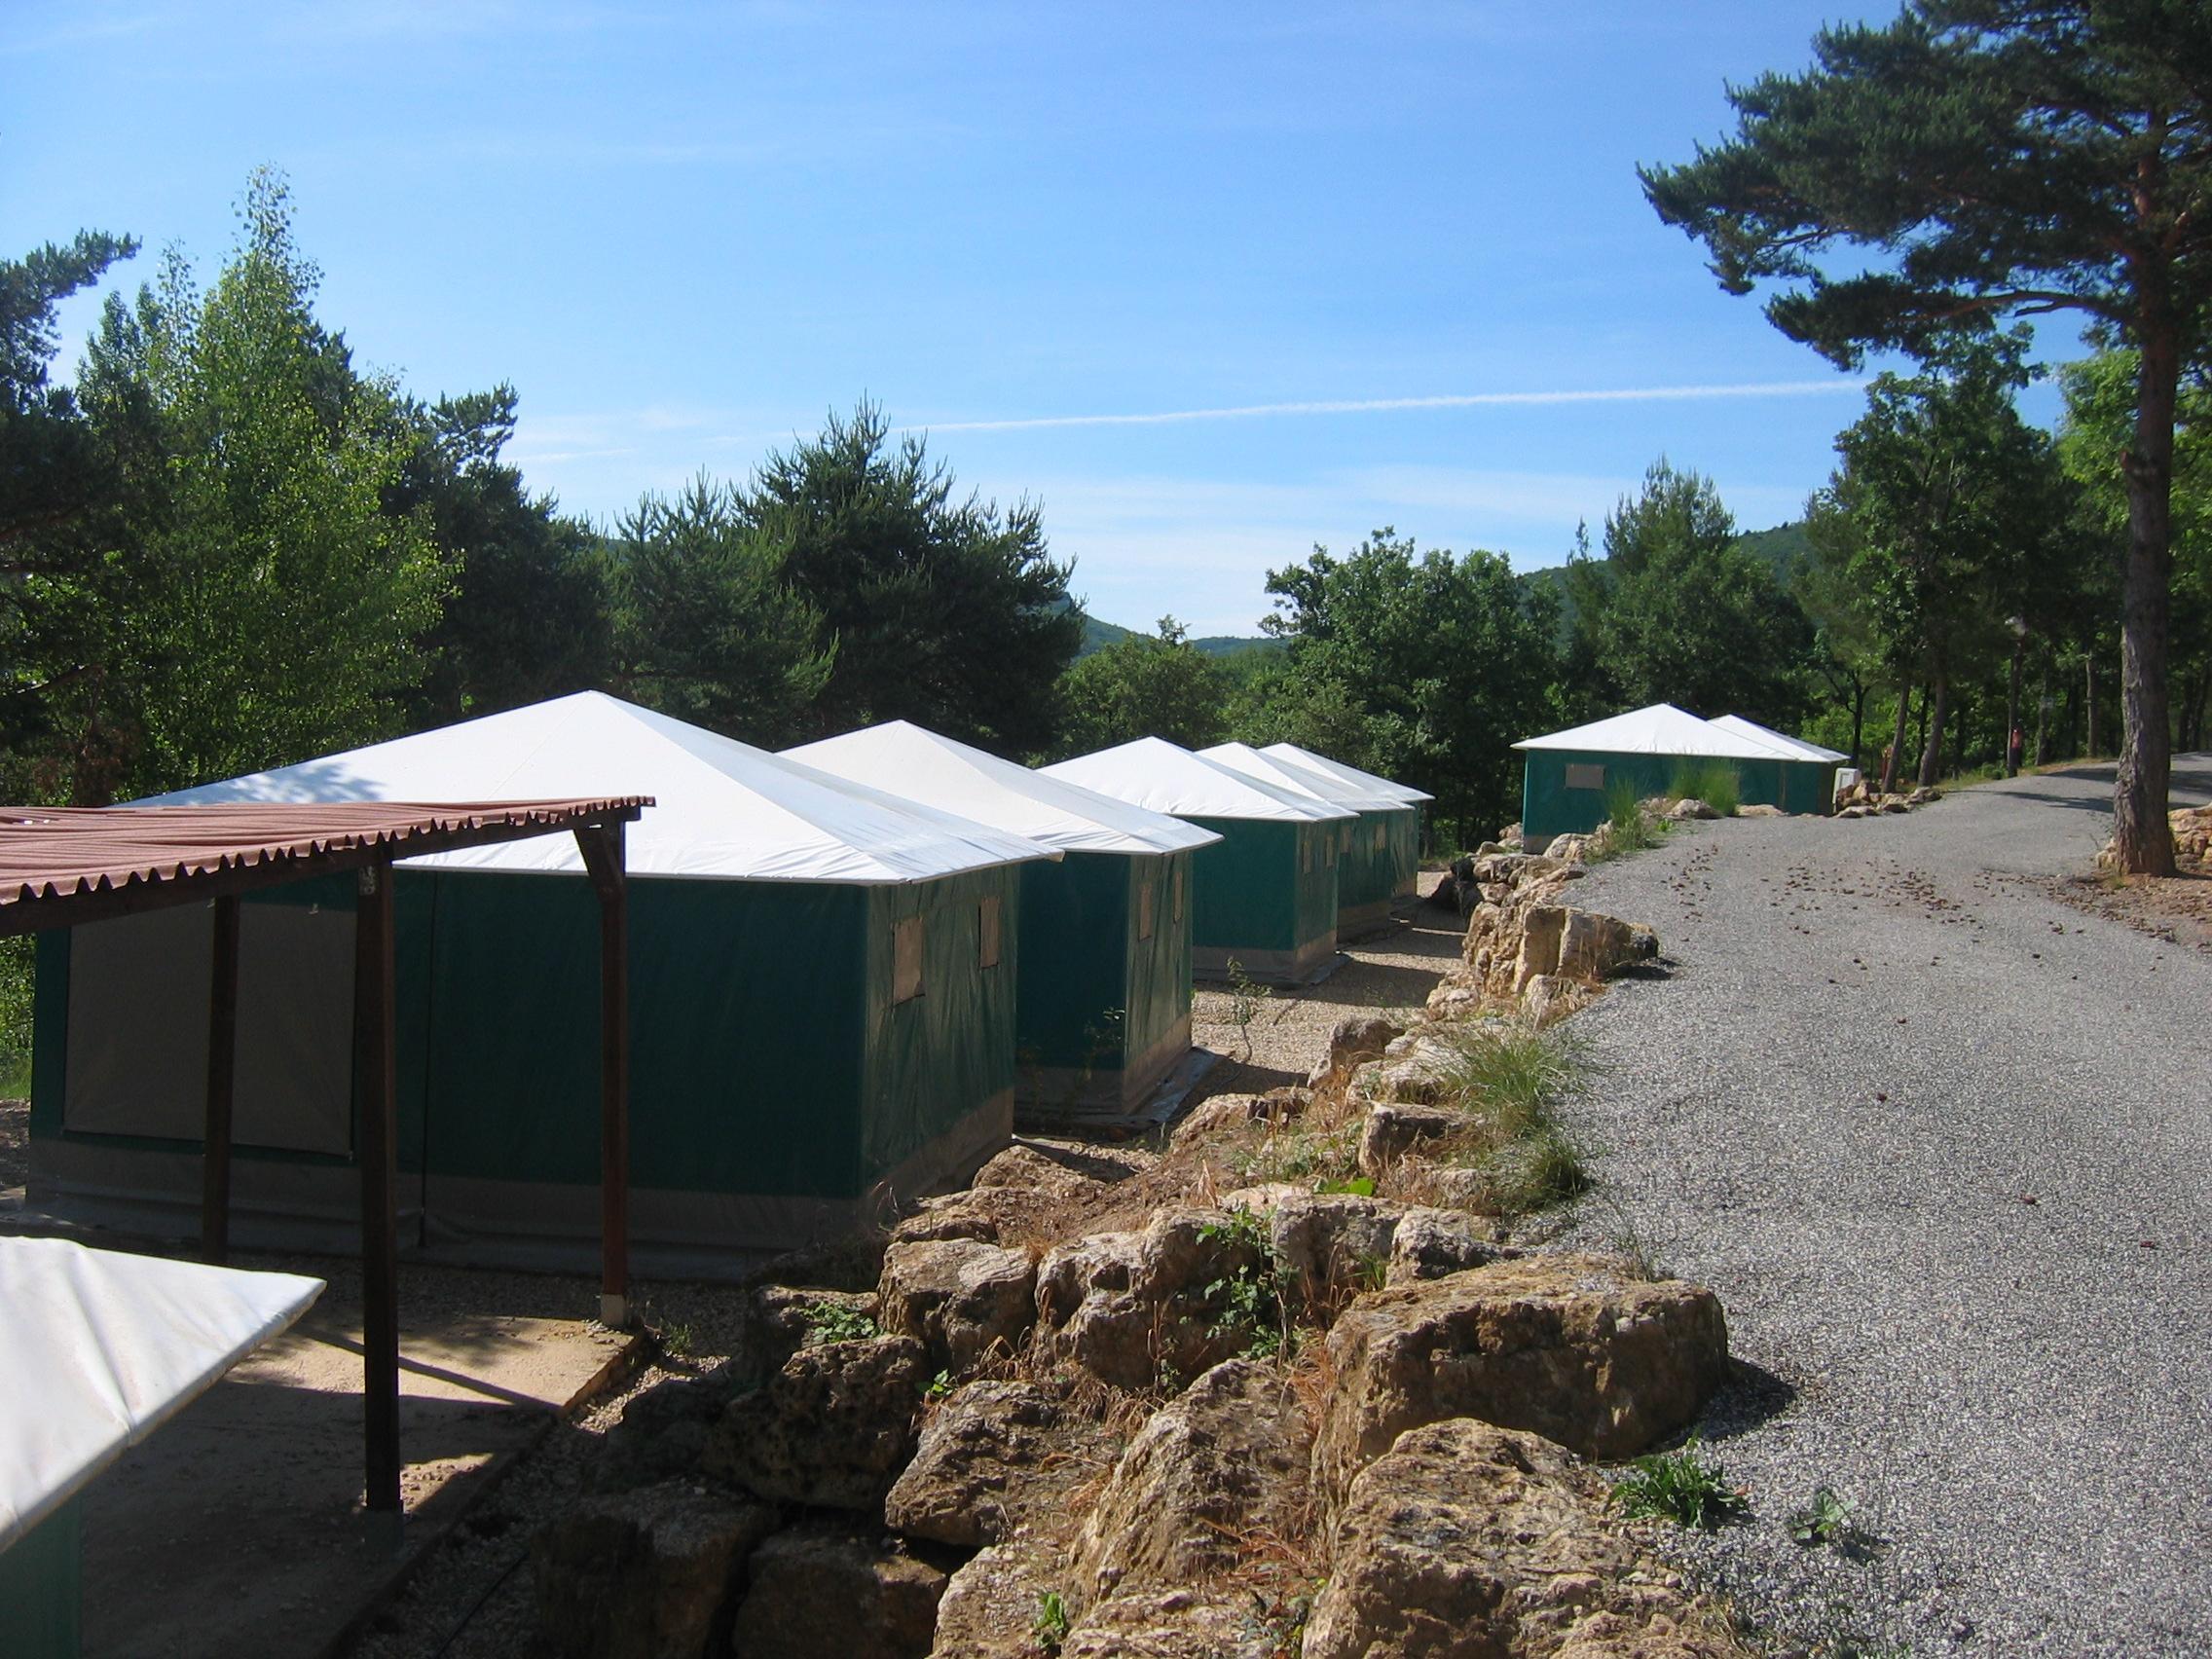 Camping Le Lac à Bauduen - Hébergement 2